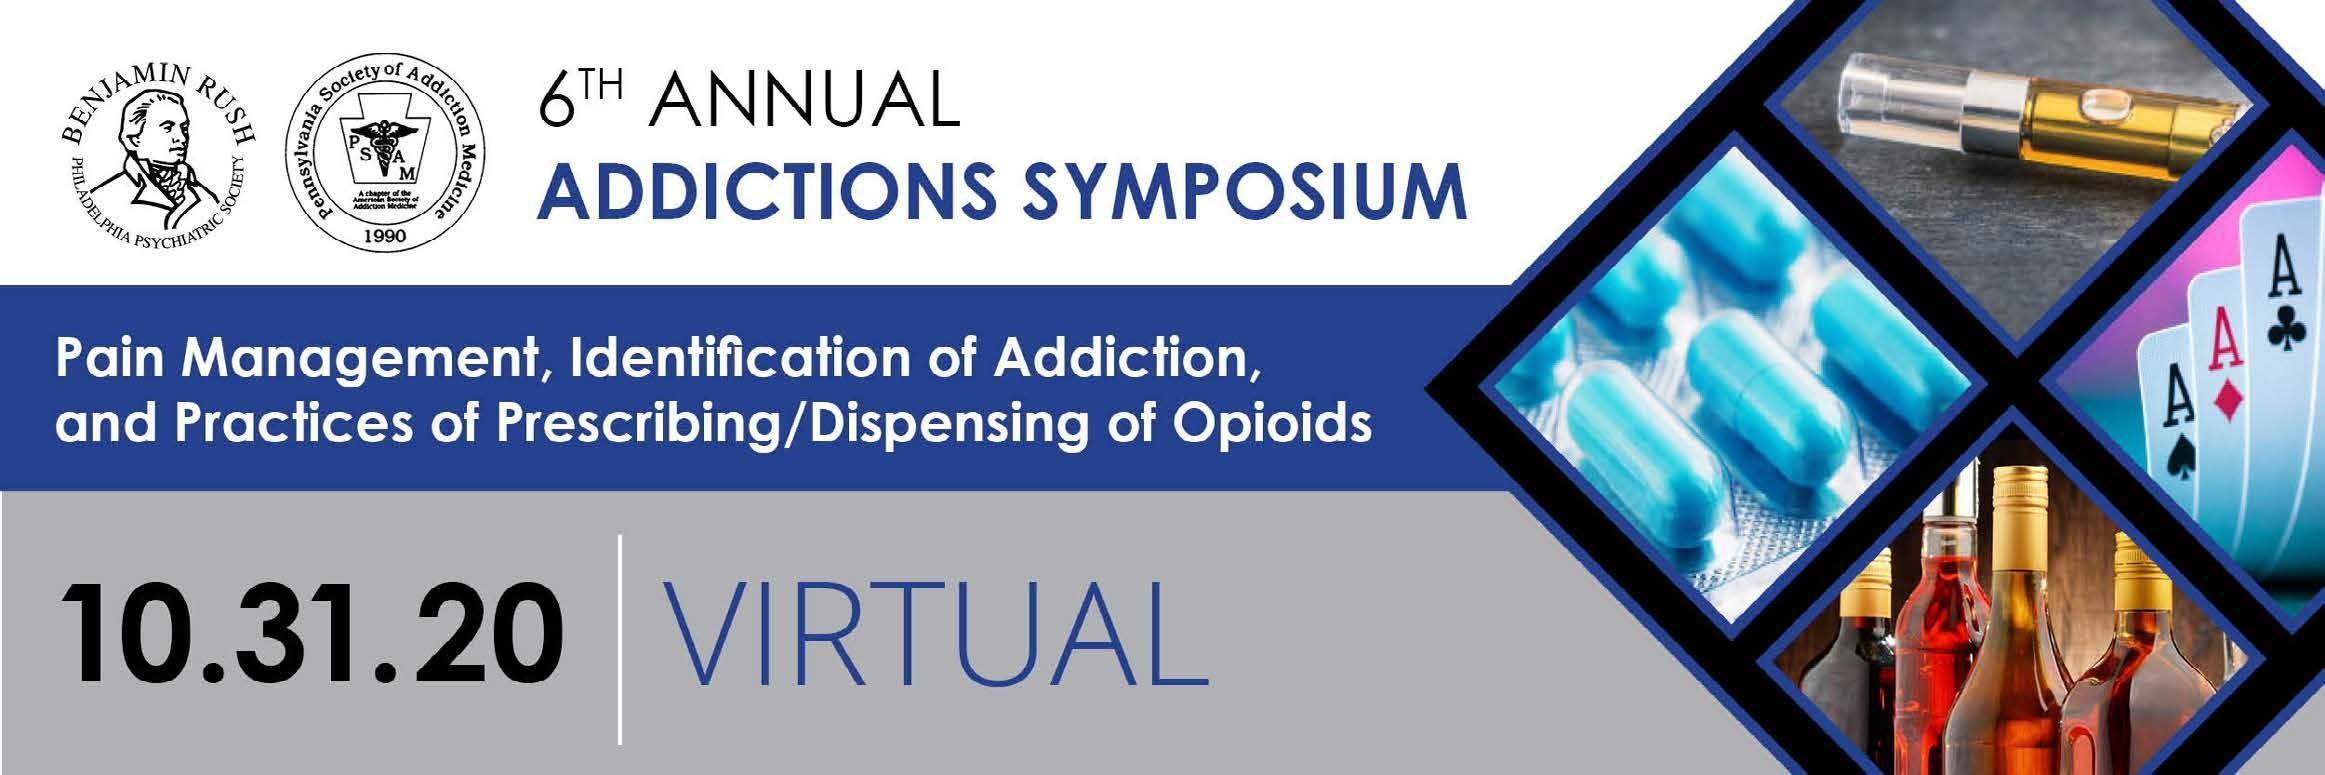 Page 13 of Addictions Symposium